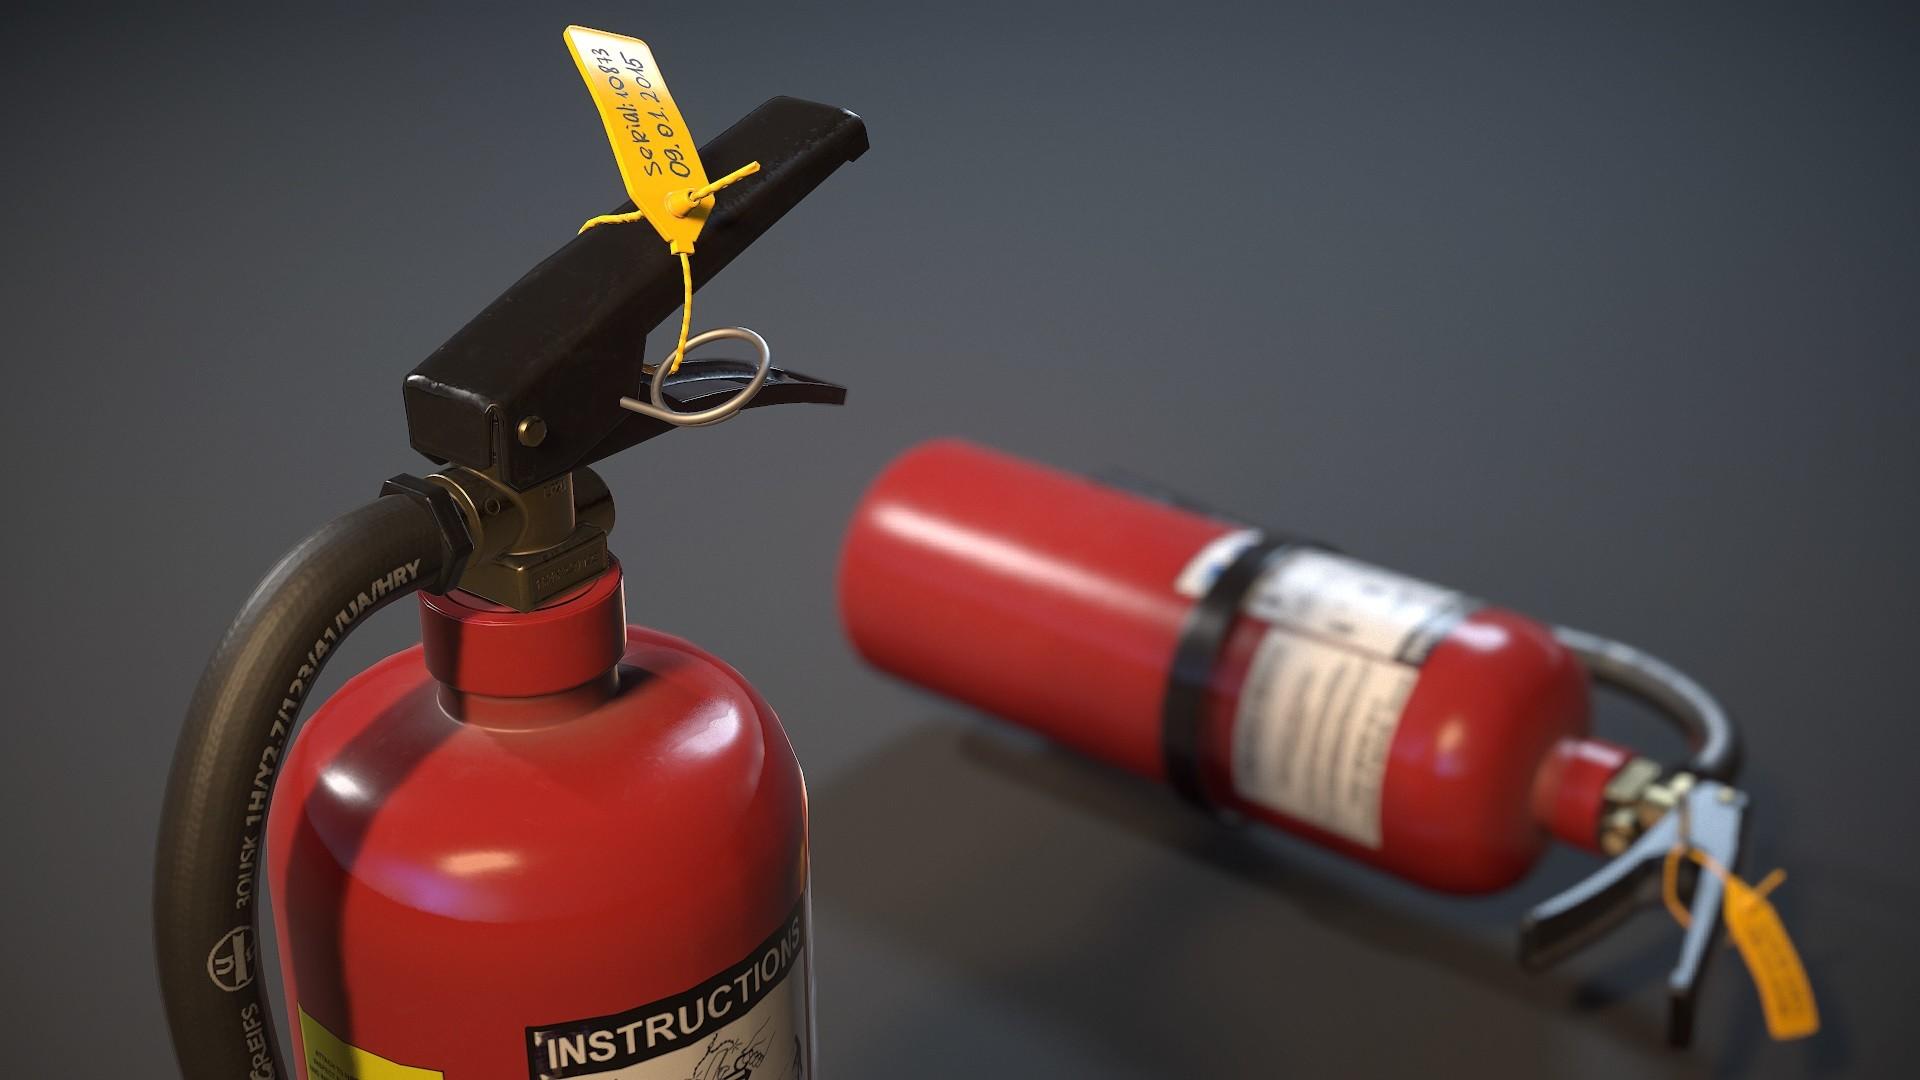 fire-extinguisher-vibrator-joke-photo-rani-mukherjee-xxx-hot